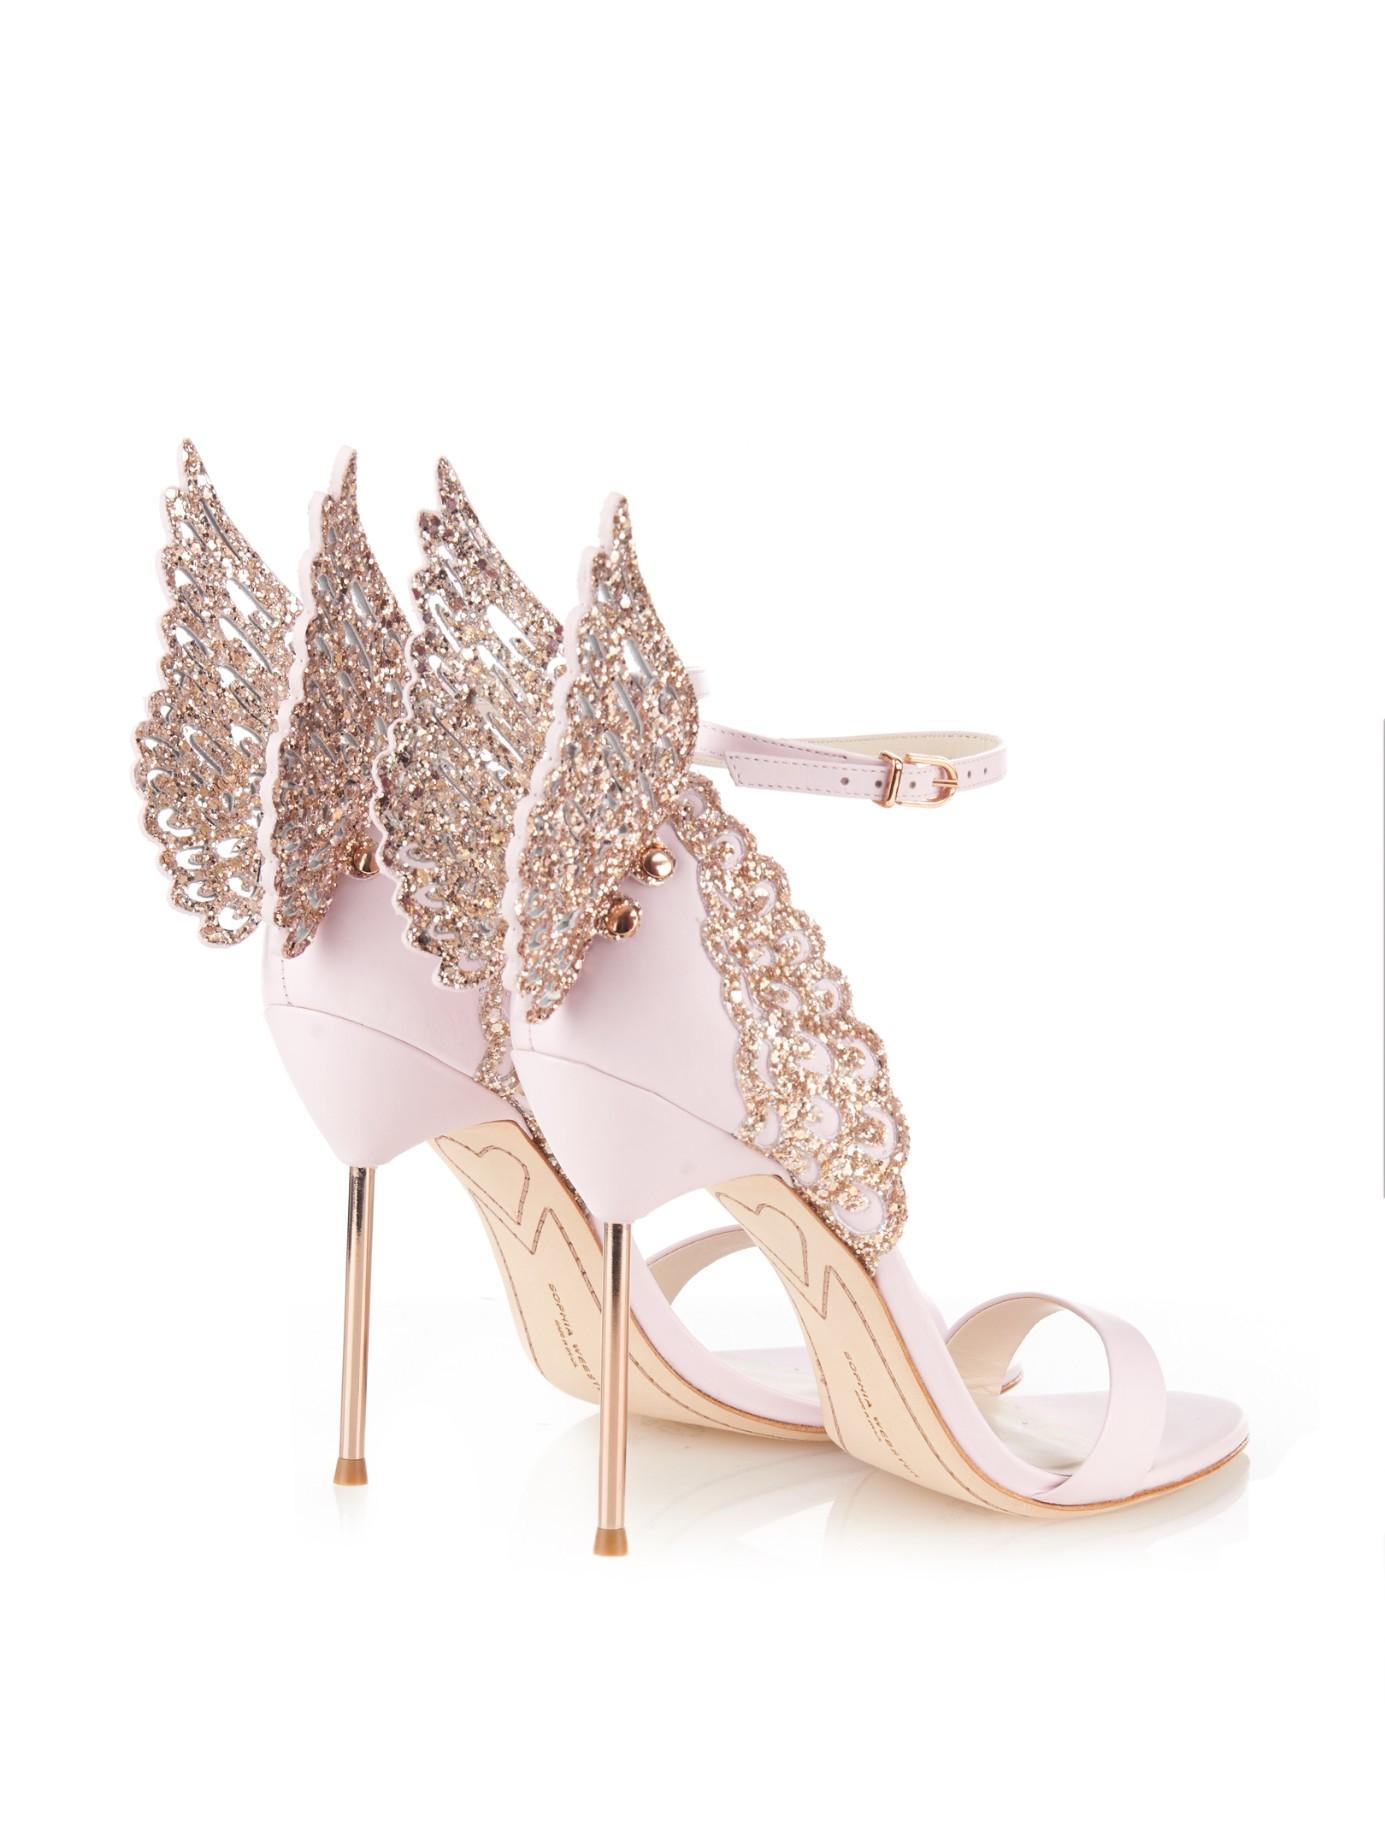 Evangeline angel-wing leather sandals Sophia Webster OVGBPPpPwS